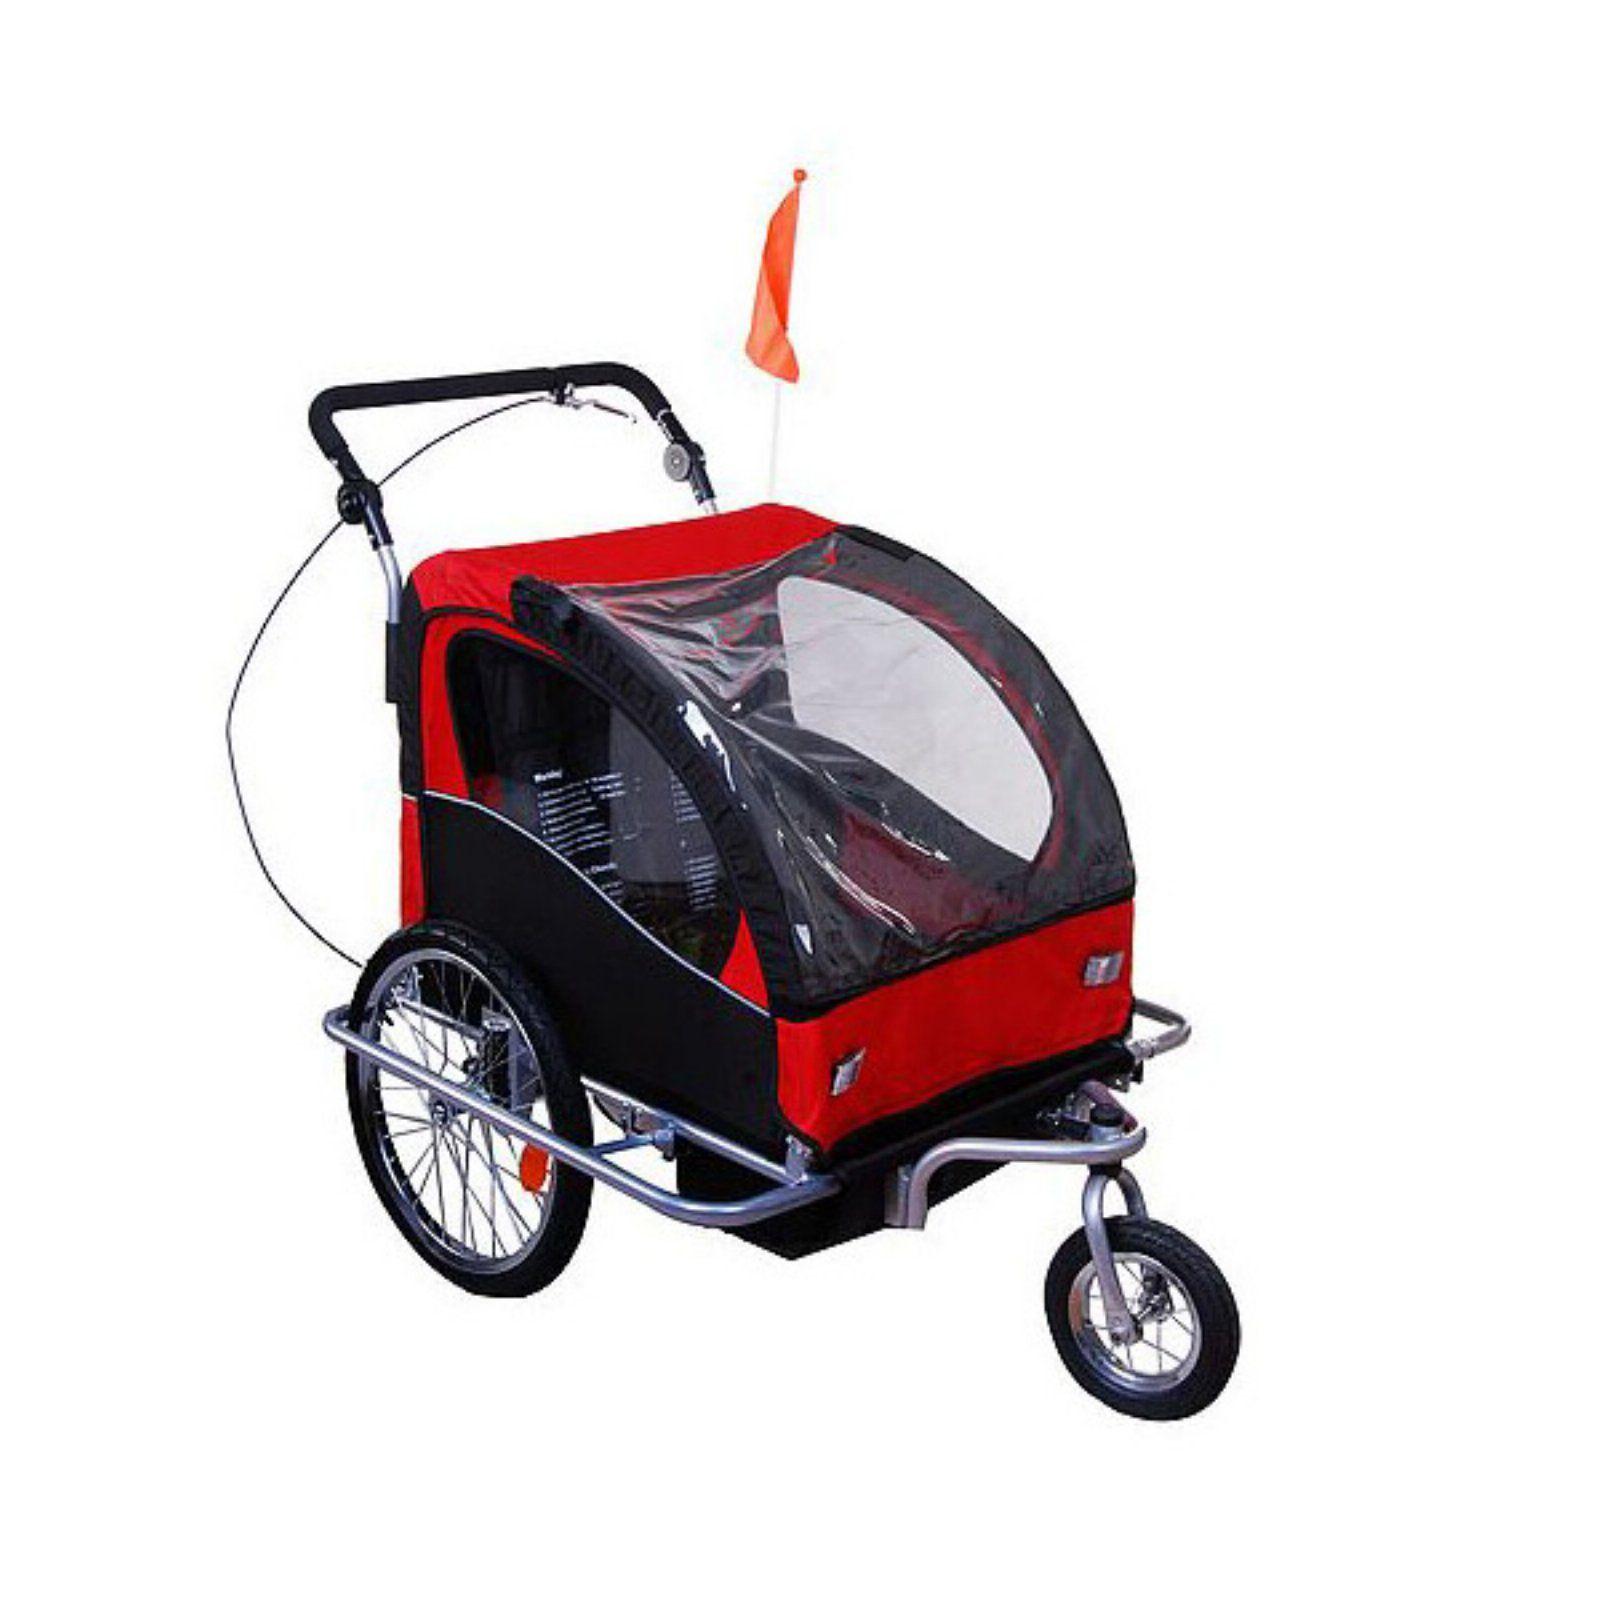 Aosom Elite II Bike Trailer Red/Black Baby bicycle